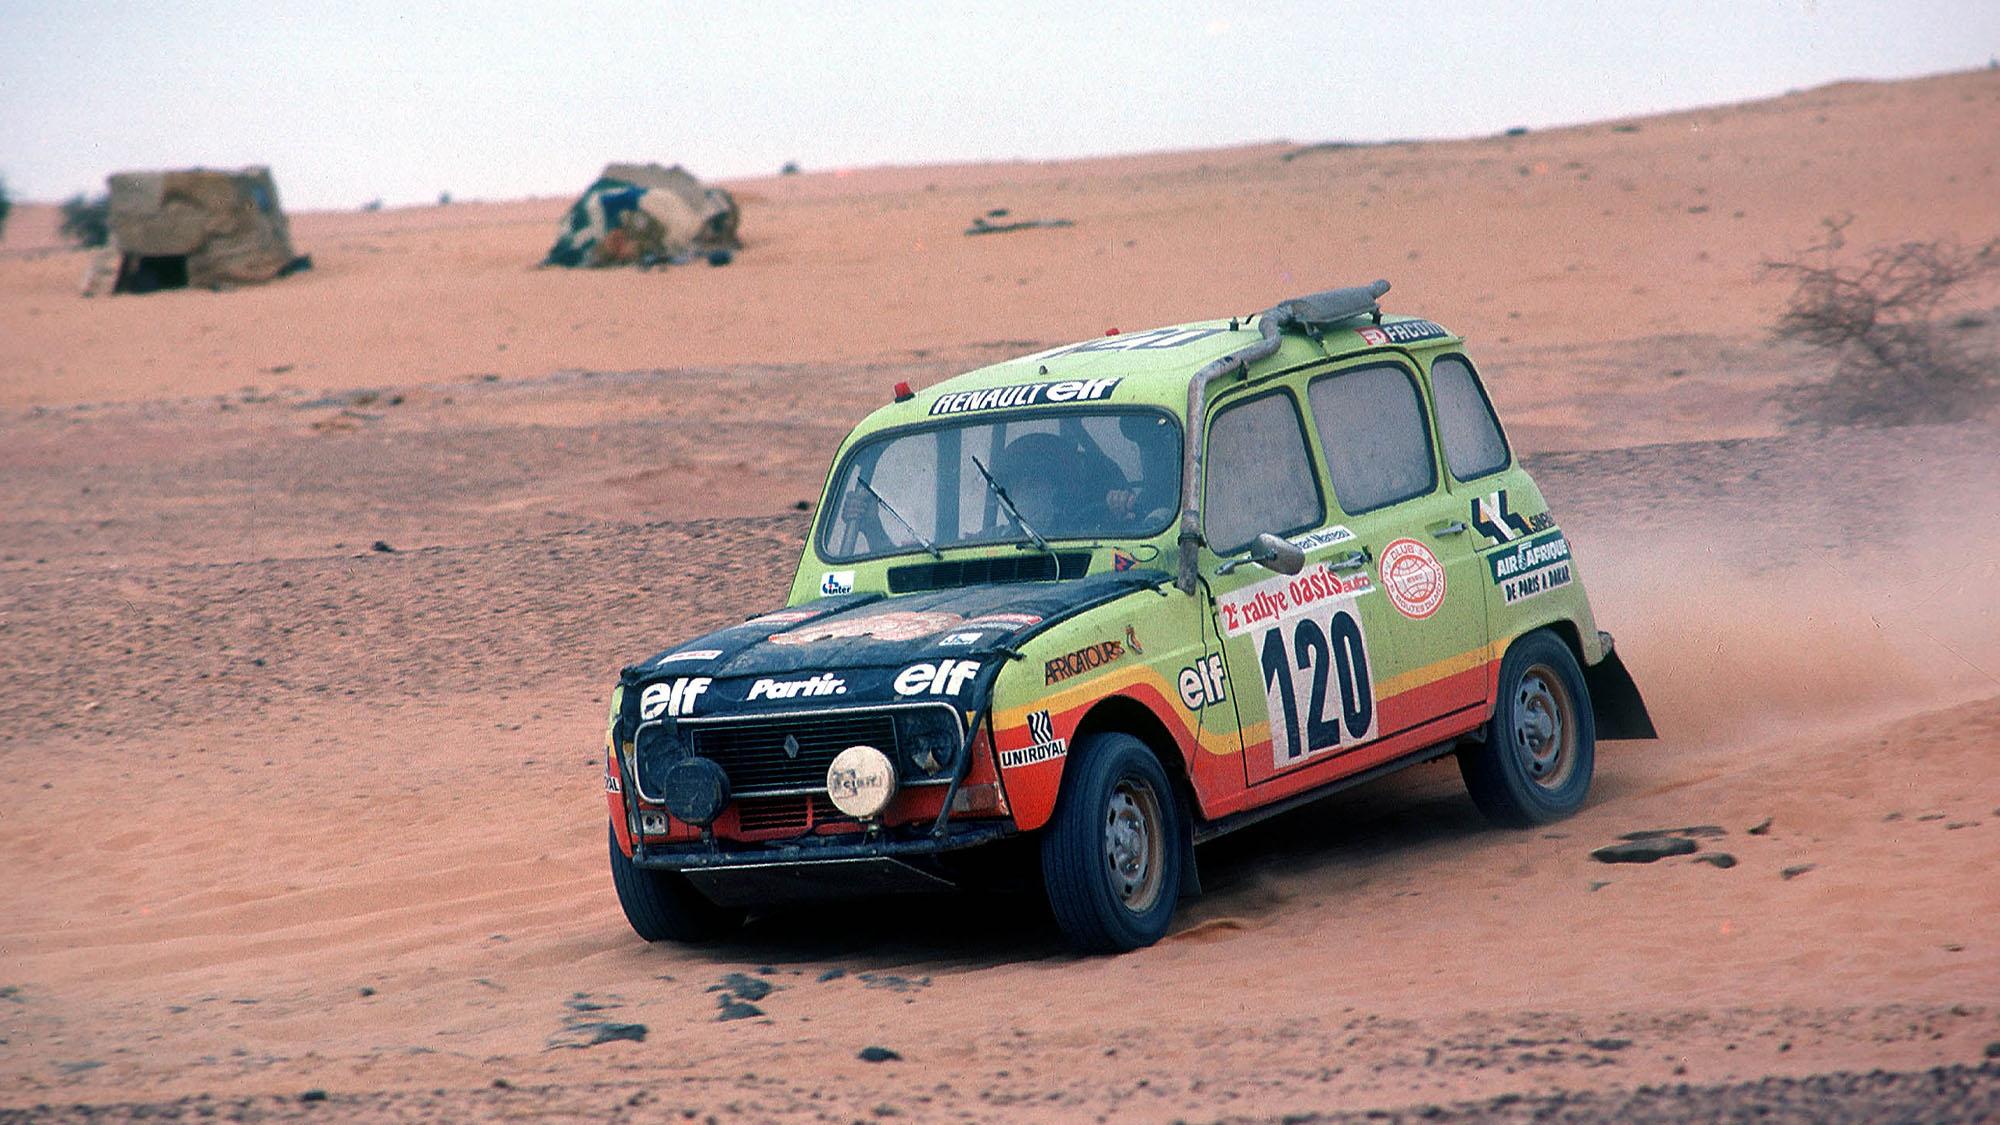 AUTO - OFF ROAD RALLY 1980 - PARIS ALGER DAKAR - N ° 120 - CLAUDE MARREAU (FRA) - BERNARD MARREAU (FRA) / RENAULT 4 SINPAR - ACTION - PHOTO: DPPI